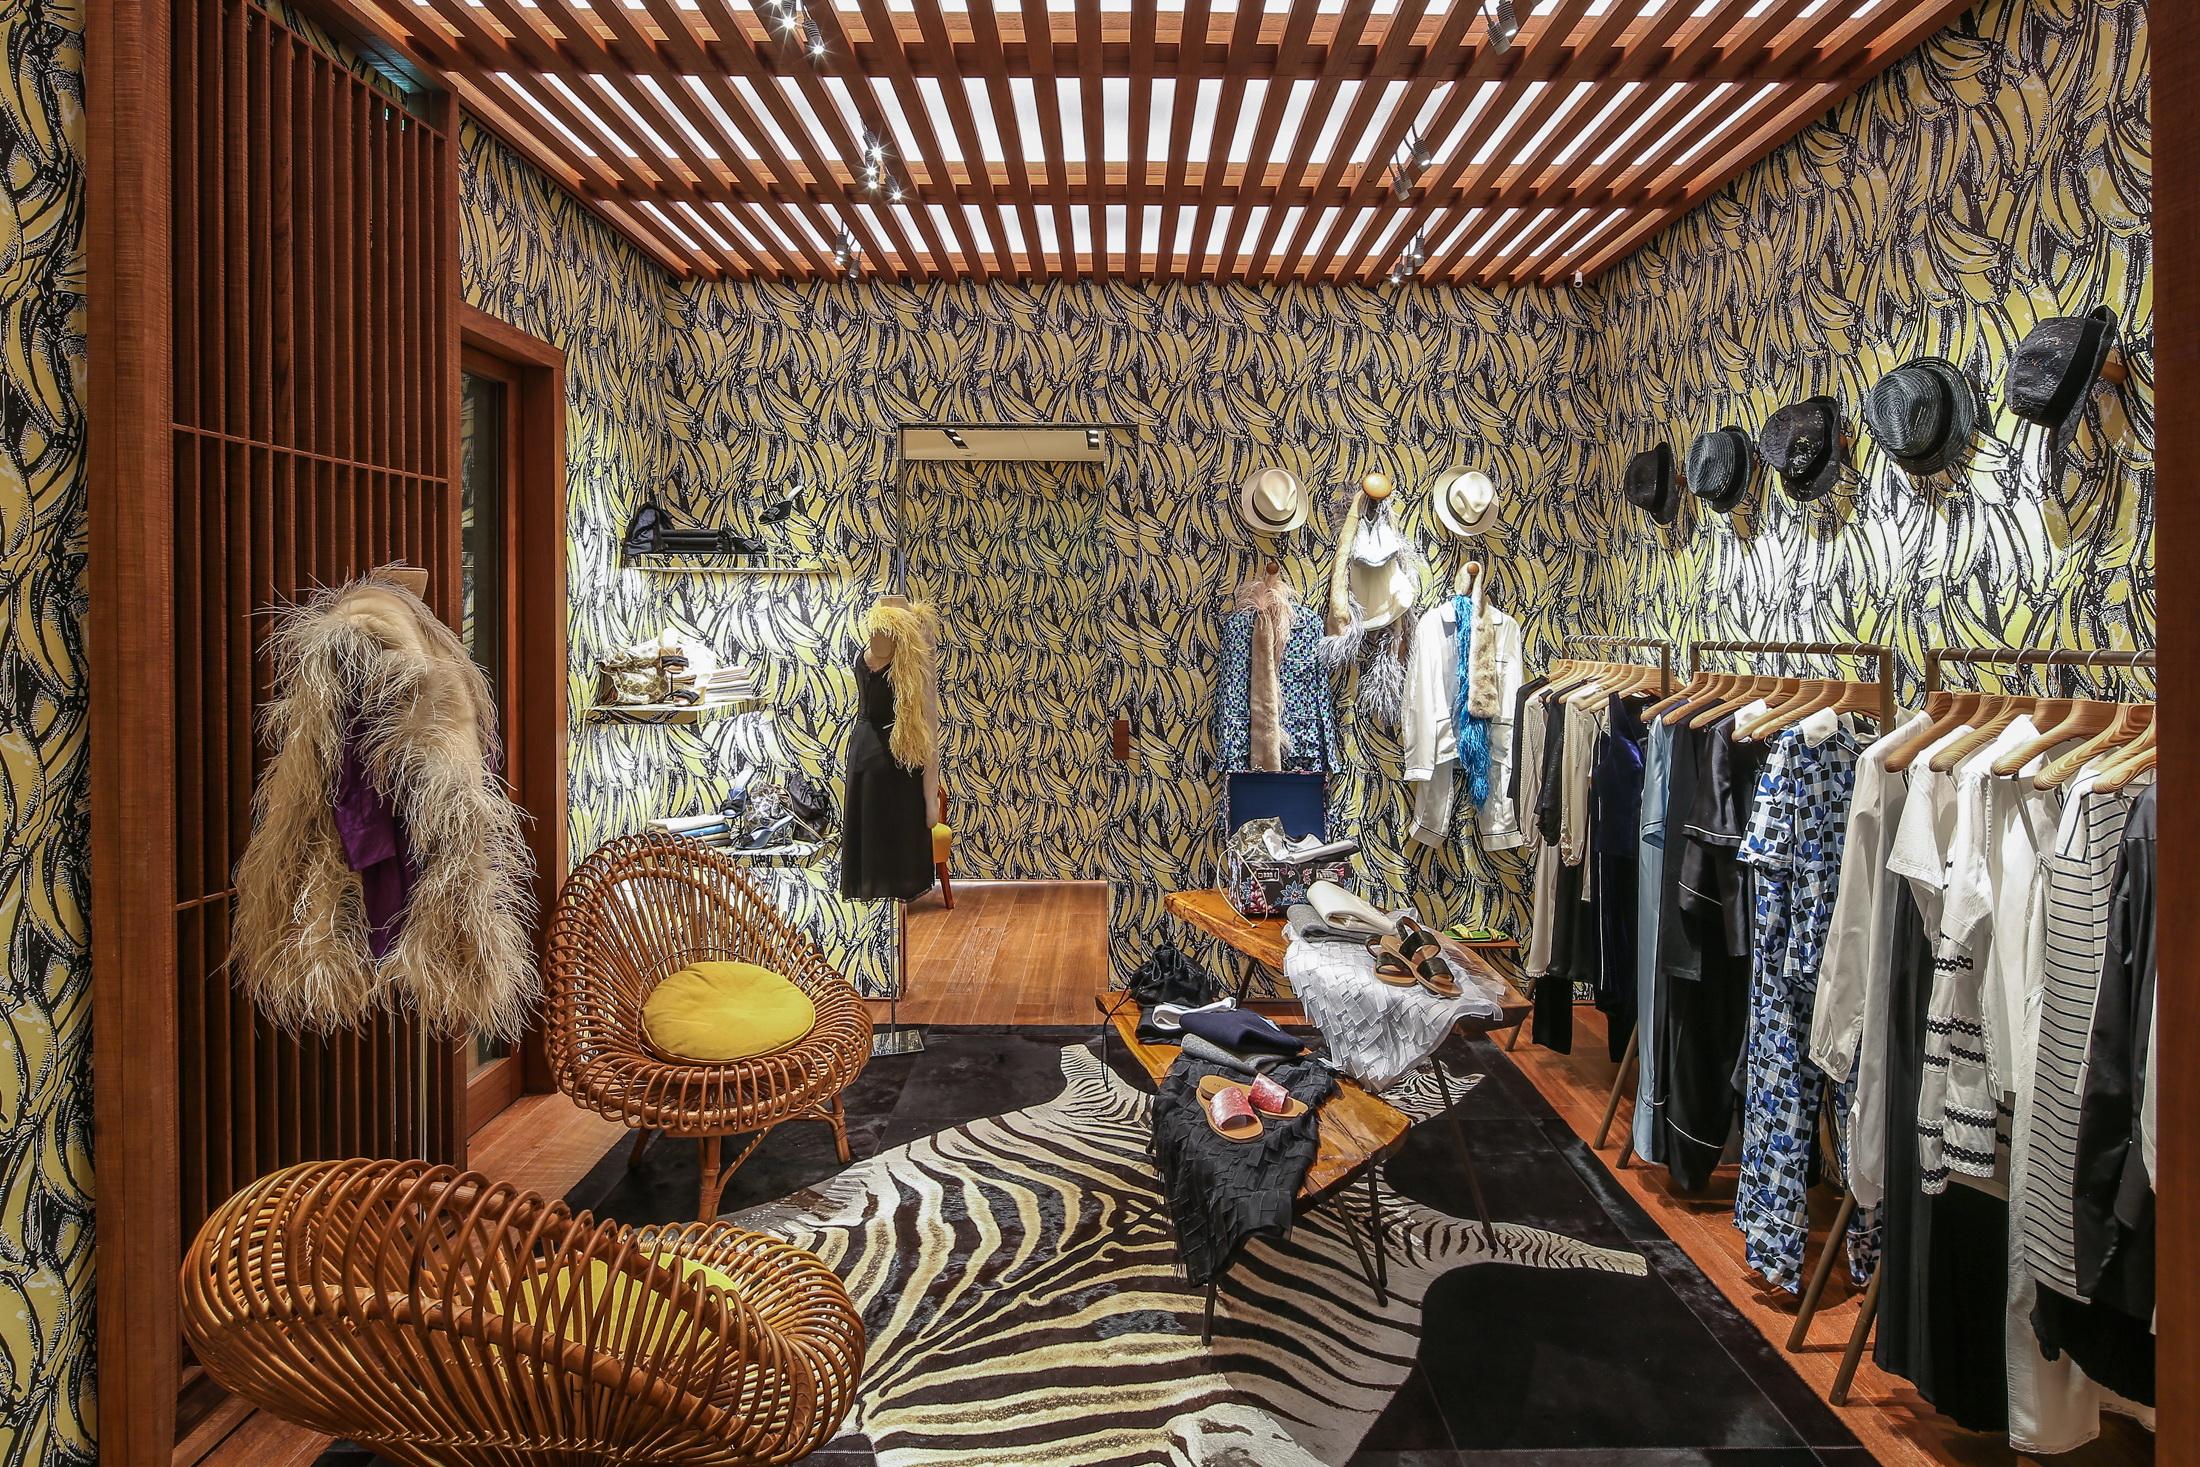 The new Prada boutique in St. Barth's.